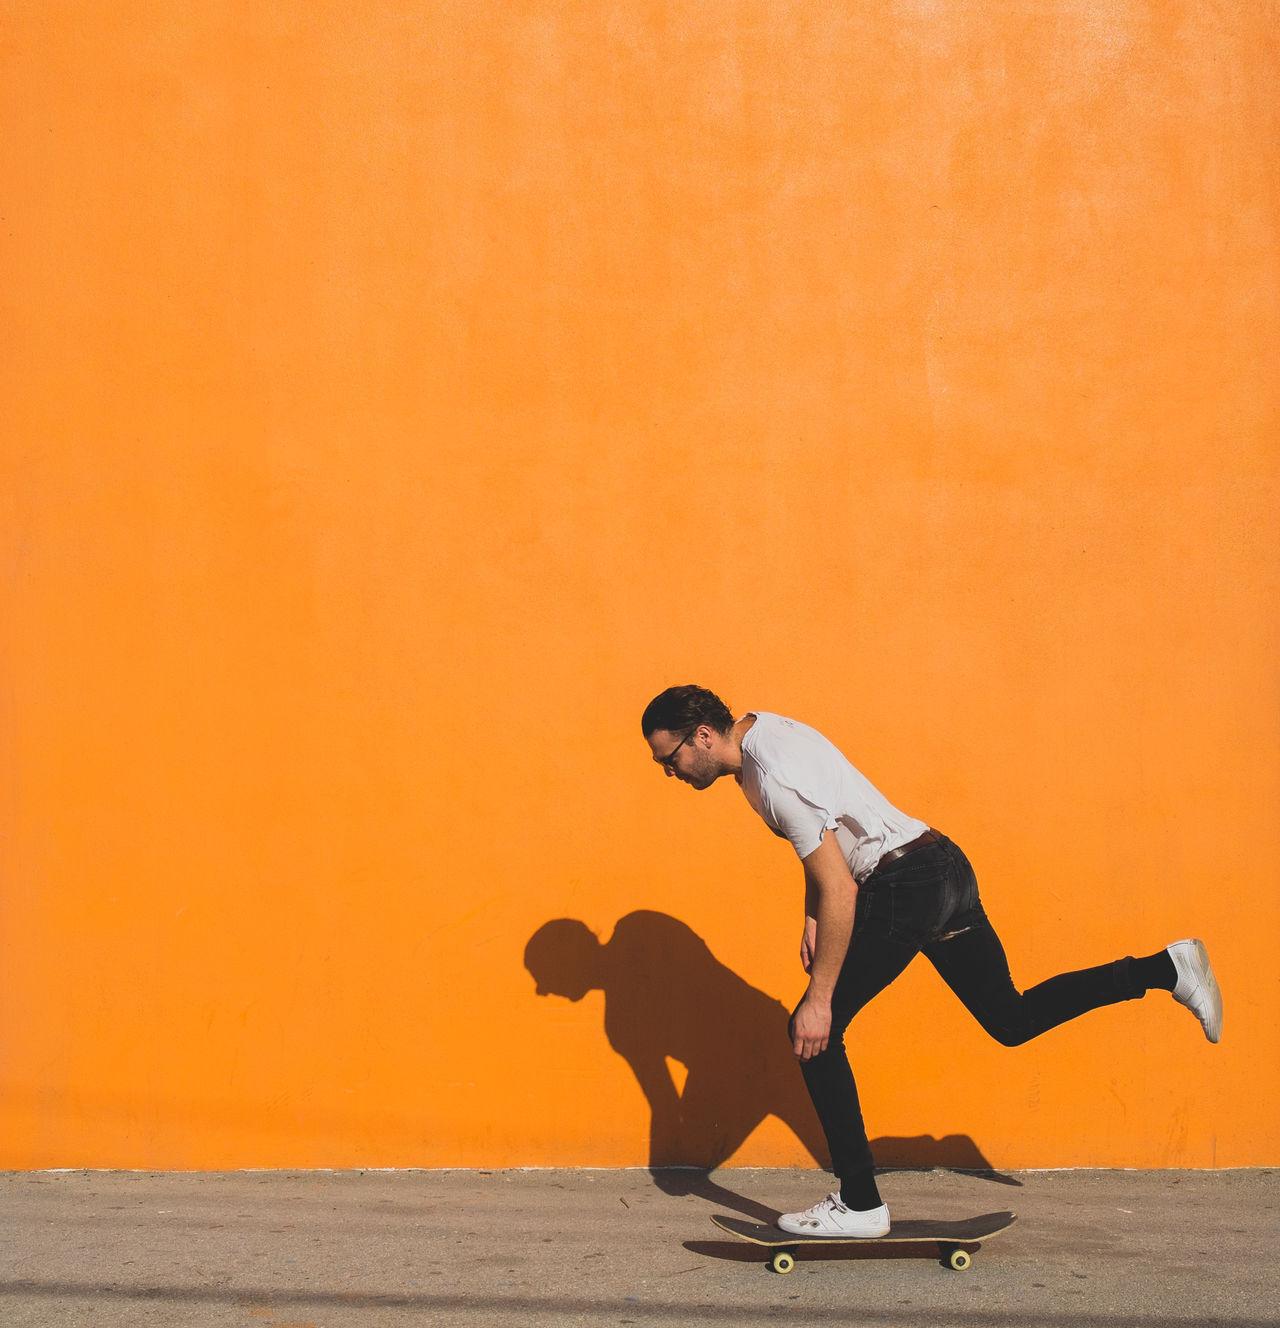 Man skateboarding on street against yellow wall